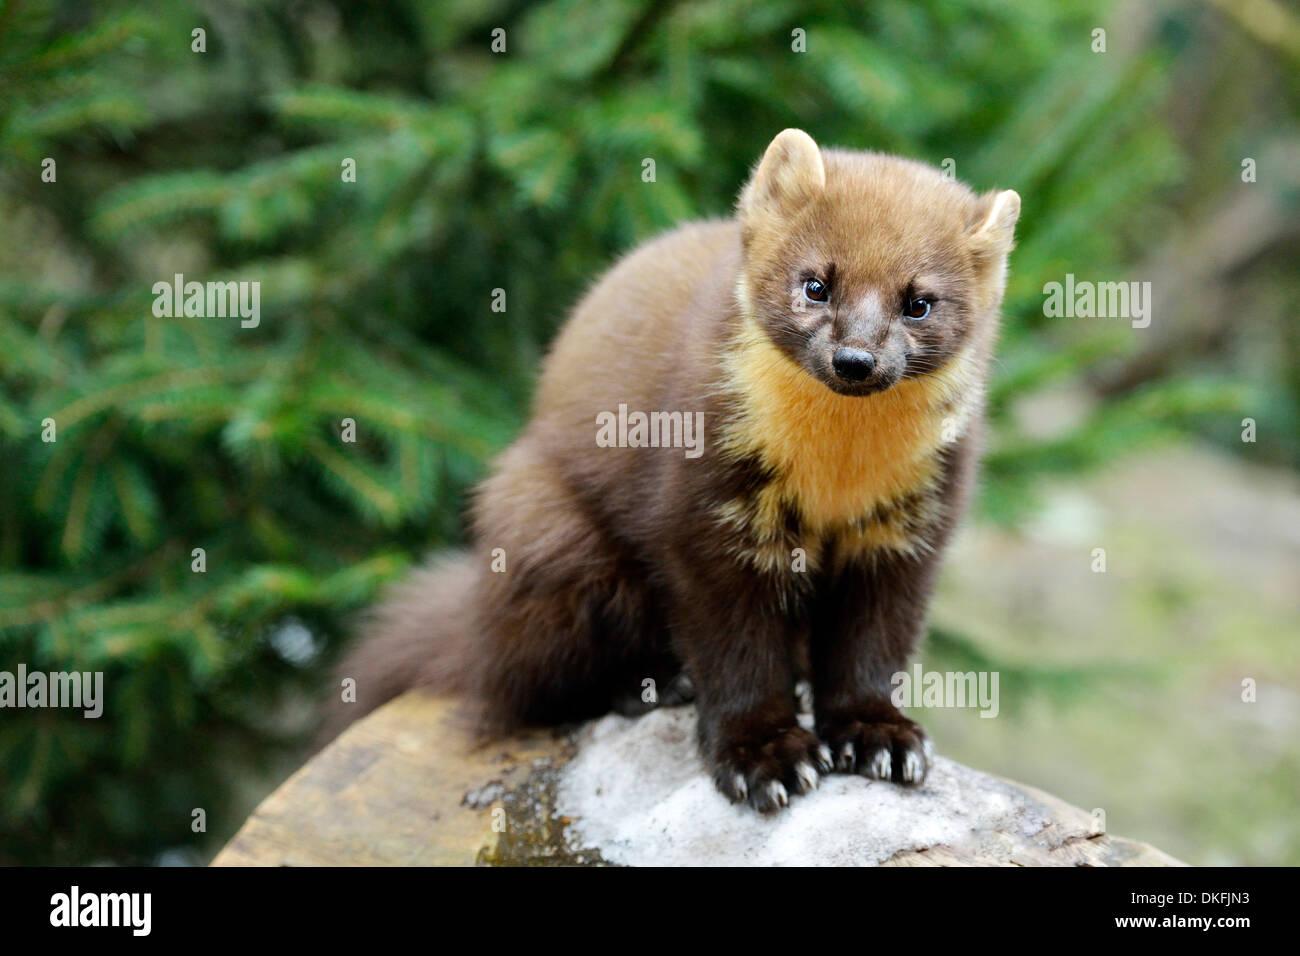 Pine Marten (Martes martes), zoo, Arth Goldau, Switzerland Stock Photo